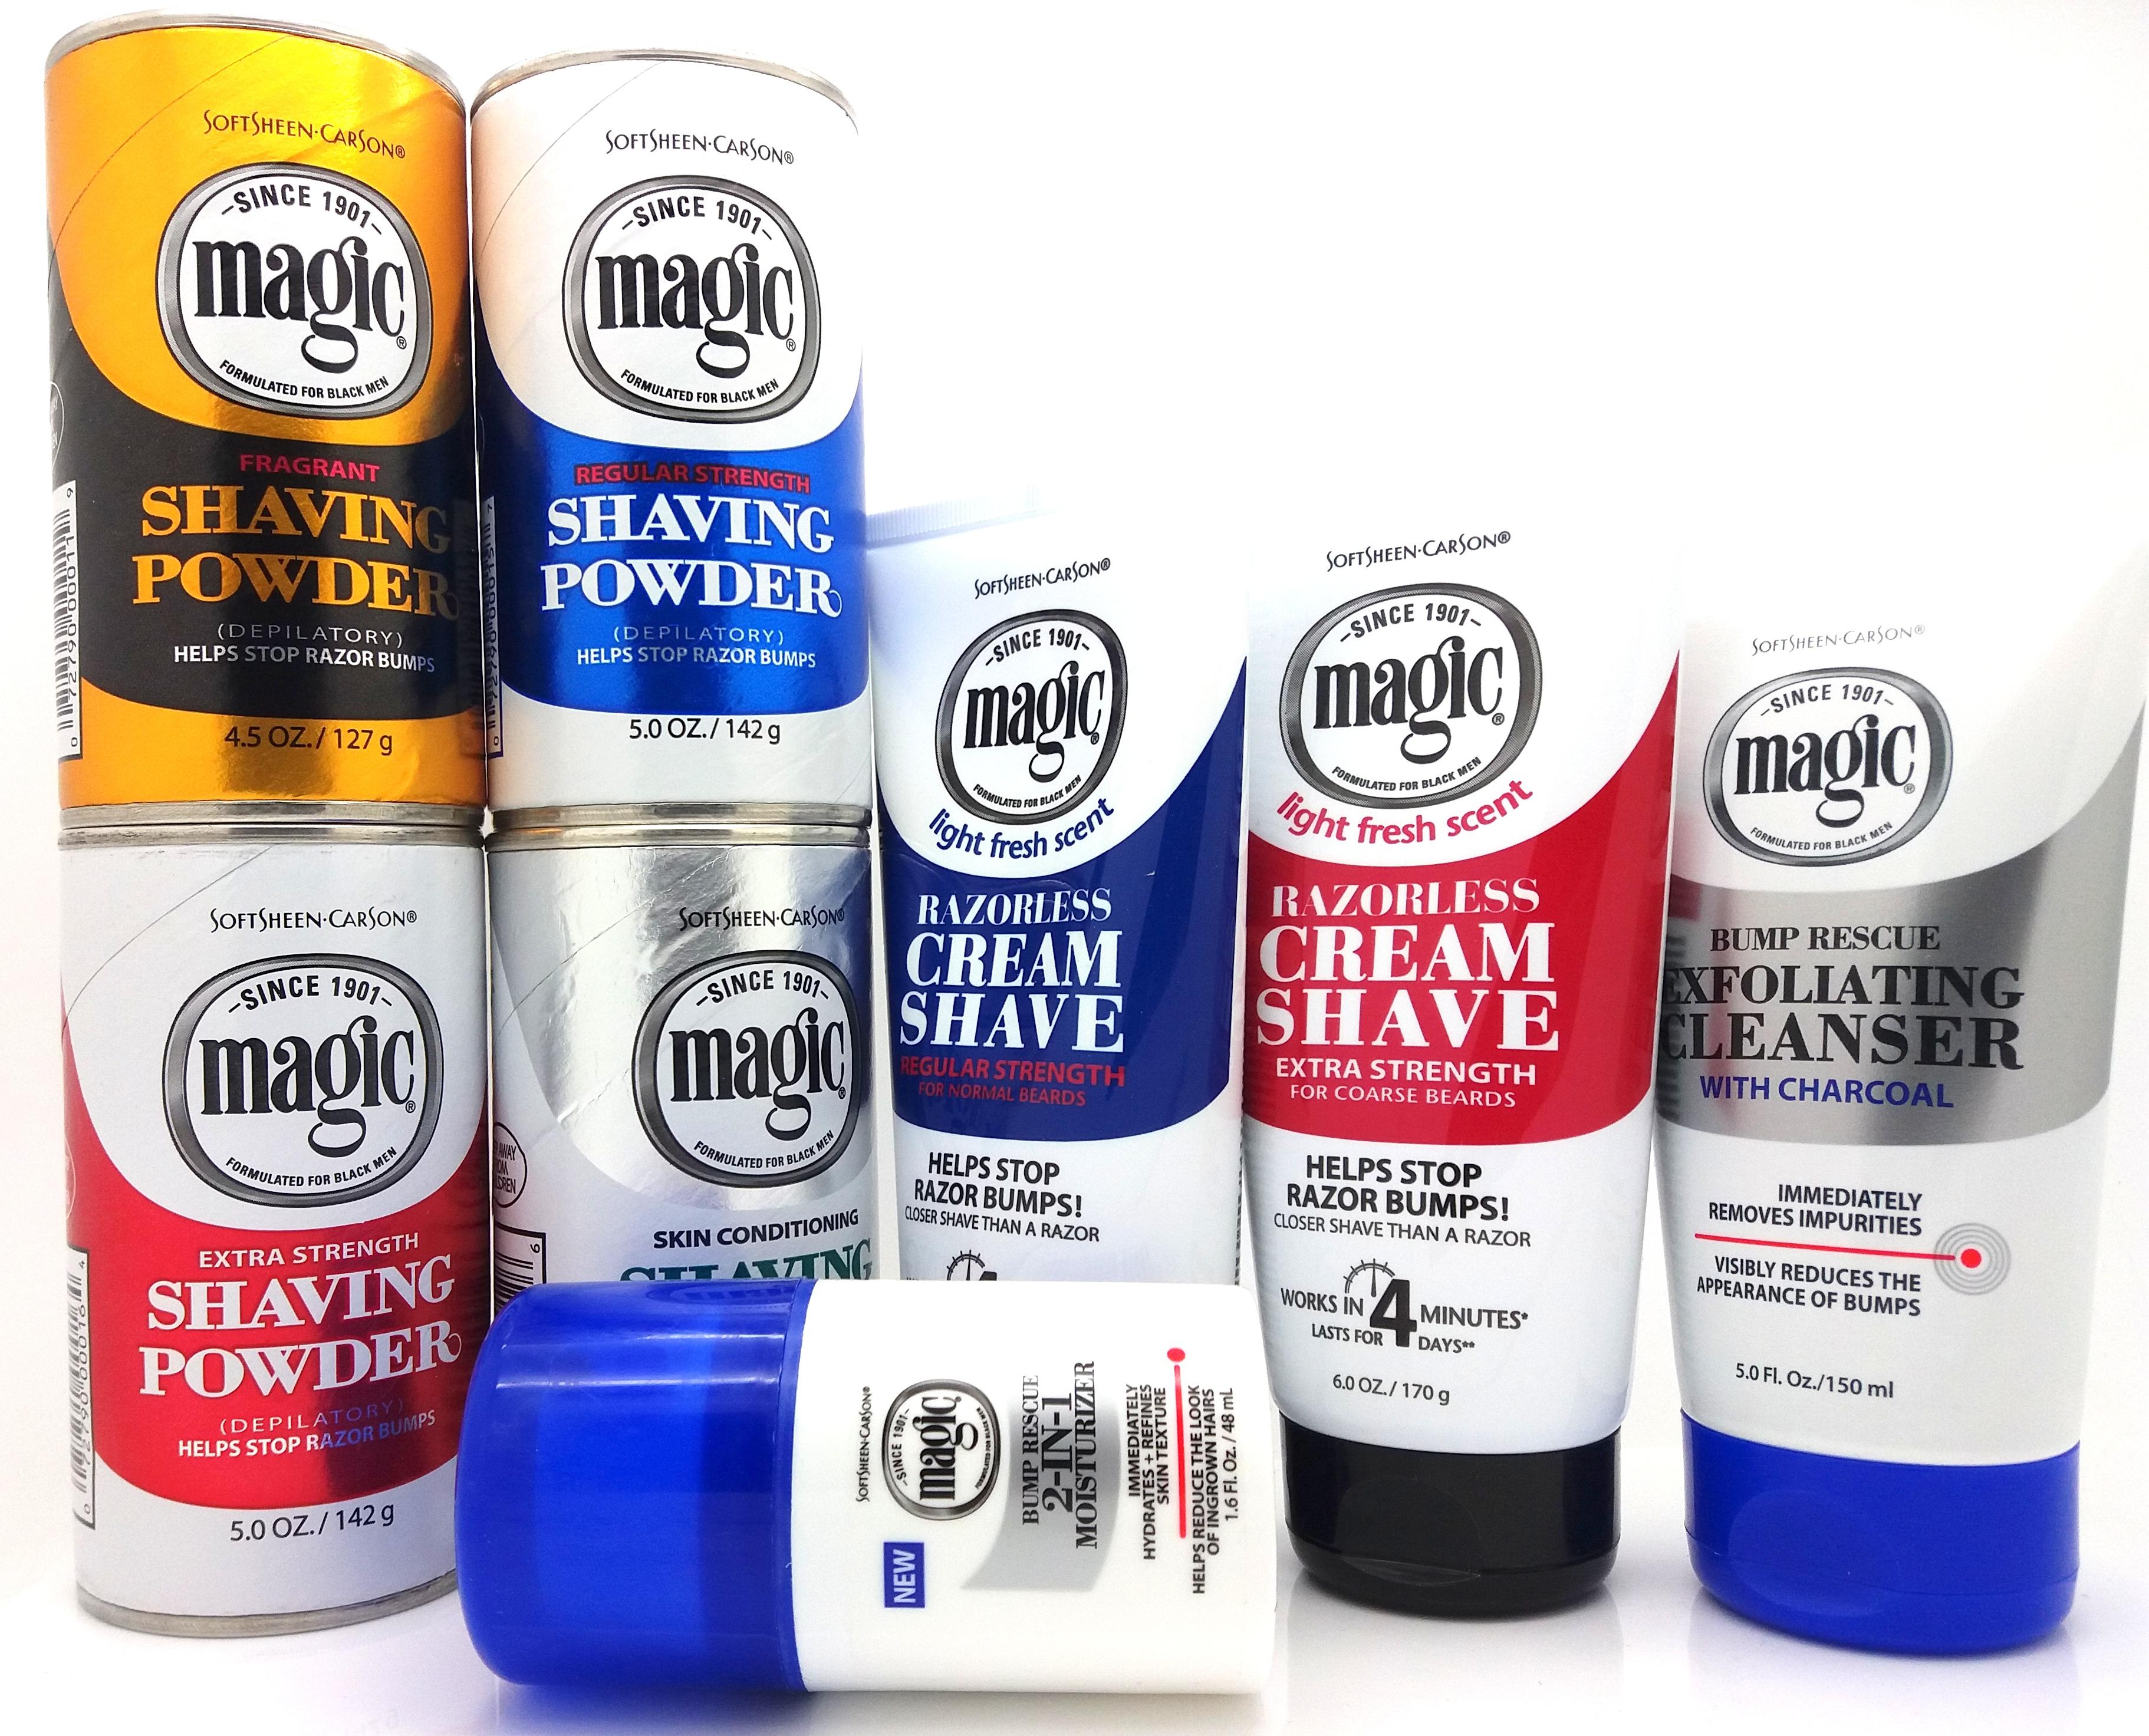 how to use magic shaving powder